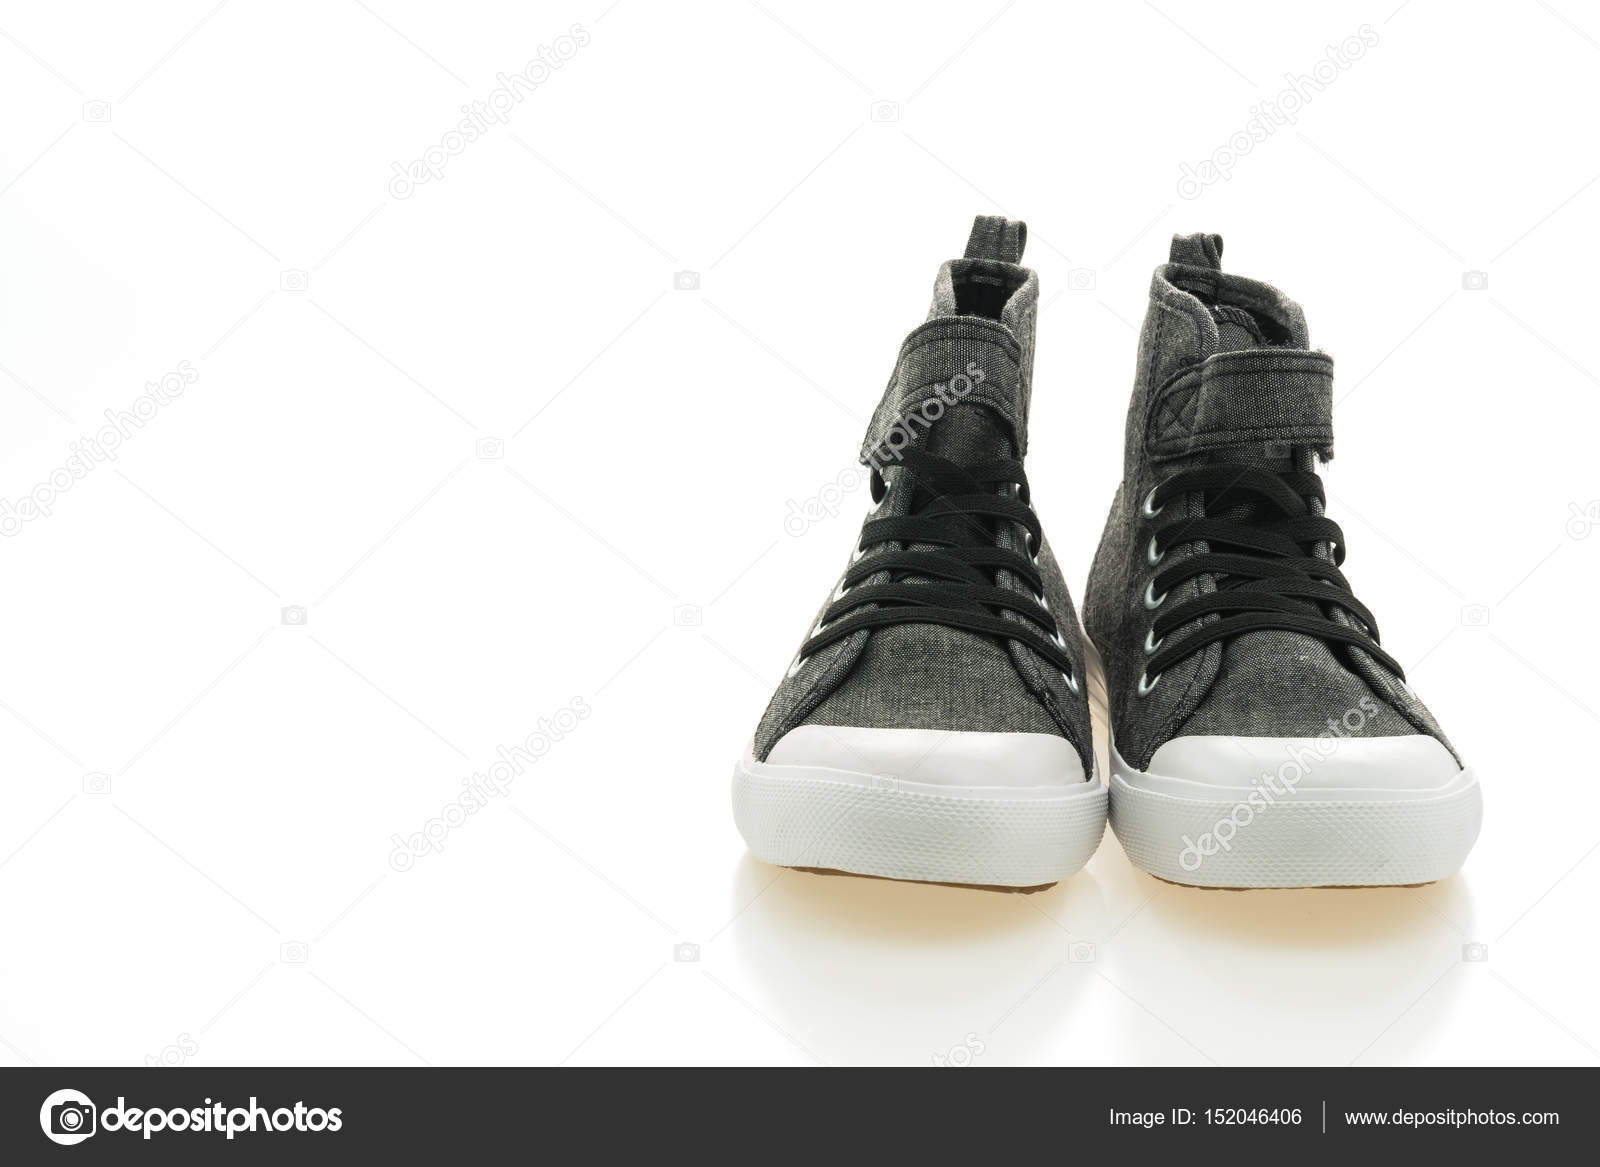 66d8cca80f6 Αρσενικό παπούτσια μόδας που απομονώνονται σε λευκό φόντο — Εικόνα από  mrsiraphol| ...